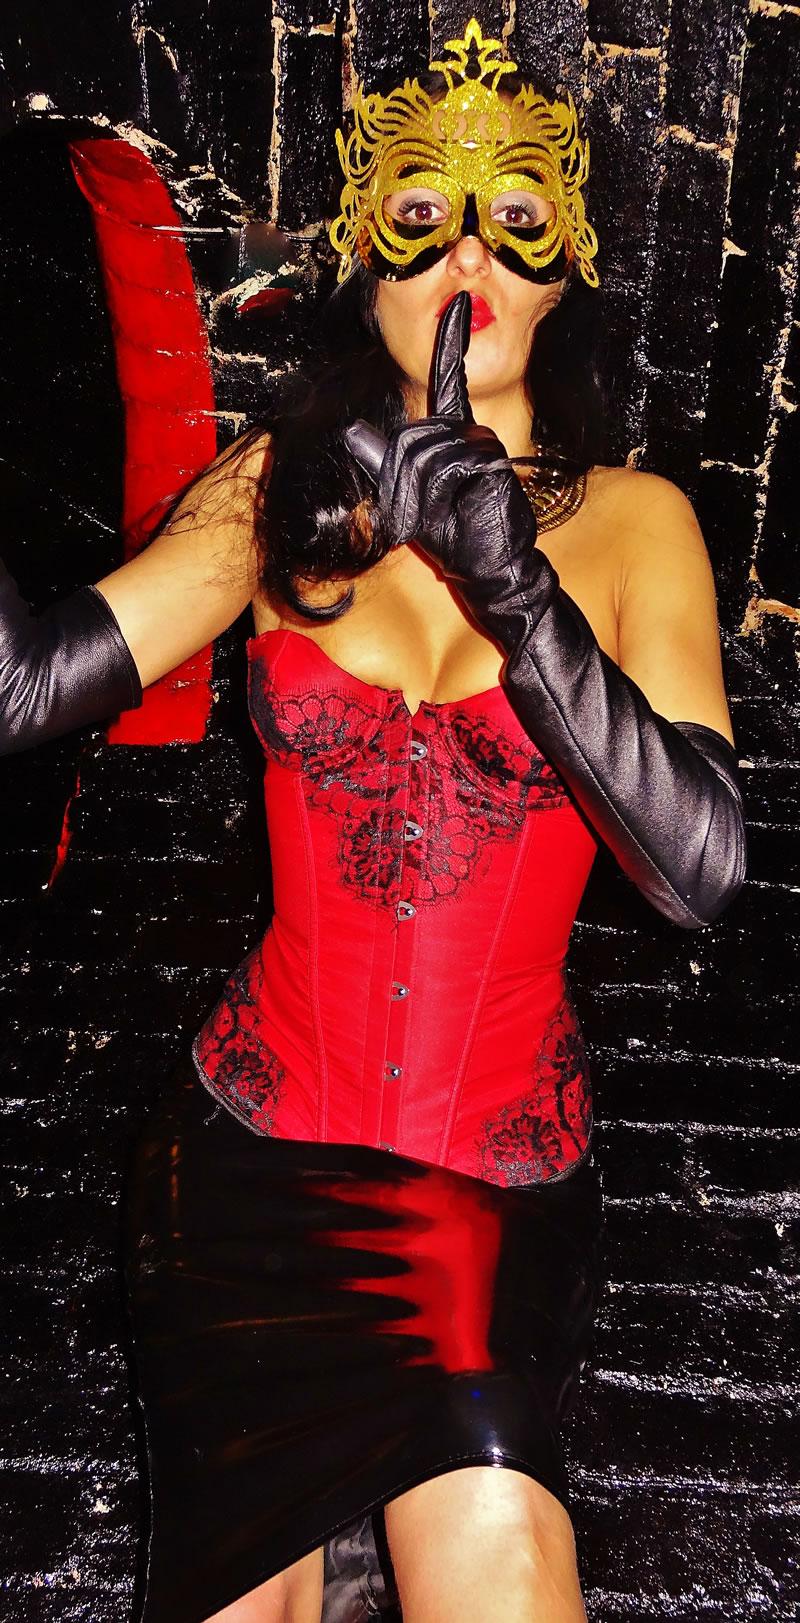 birmingham-mistress-03146